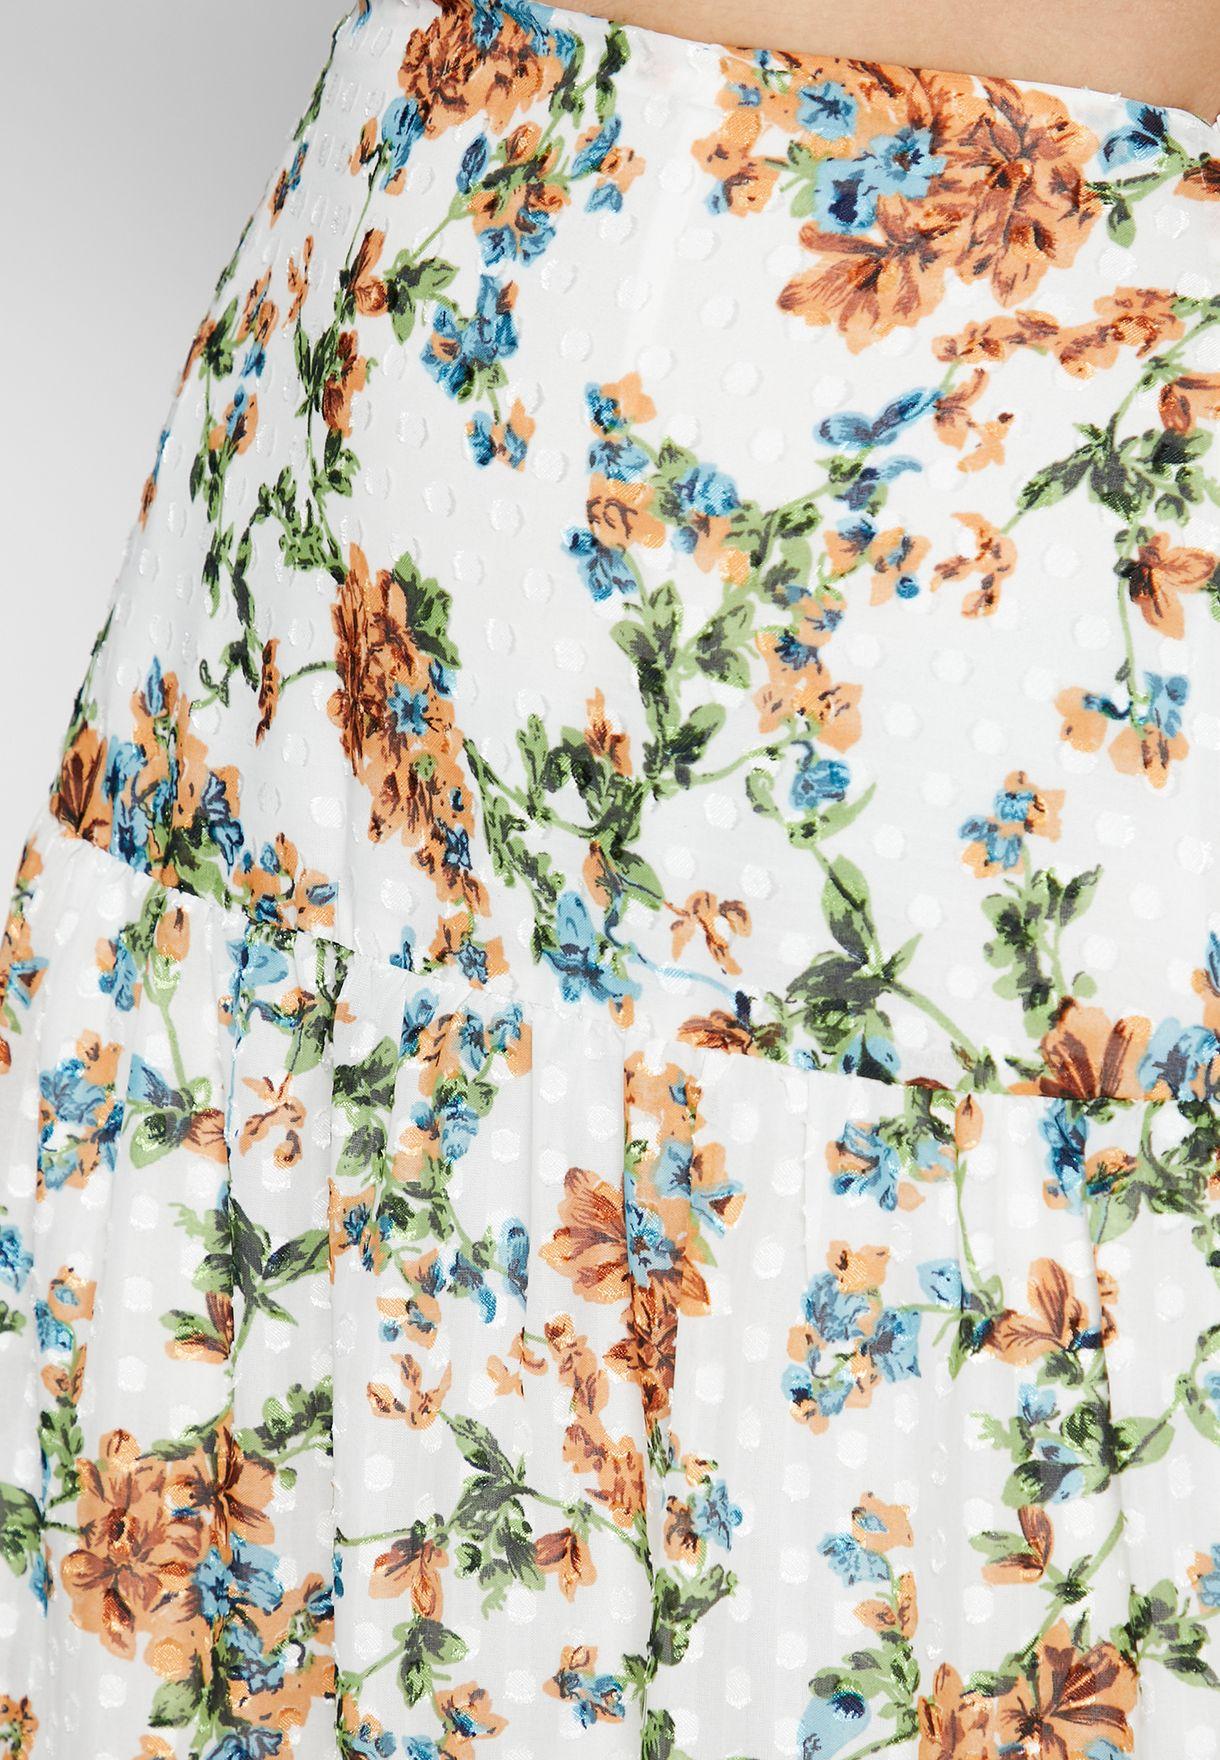 Pleat Detail Floral Print Skirt